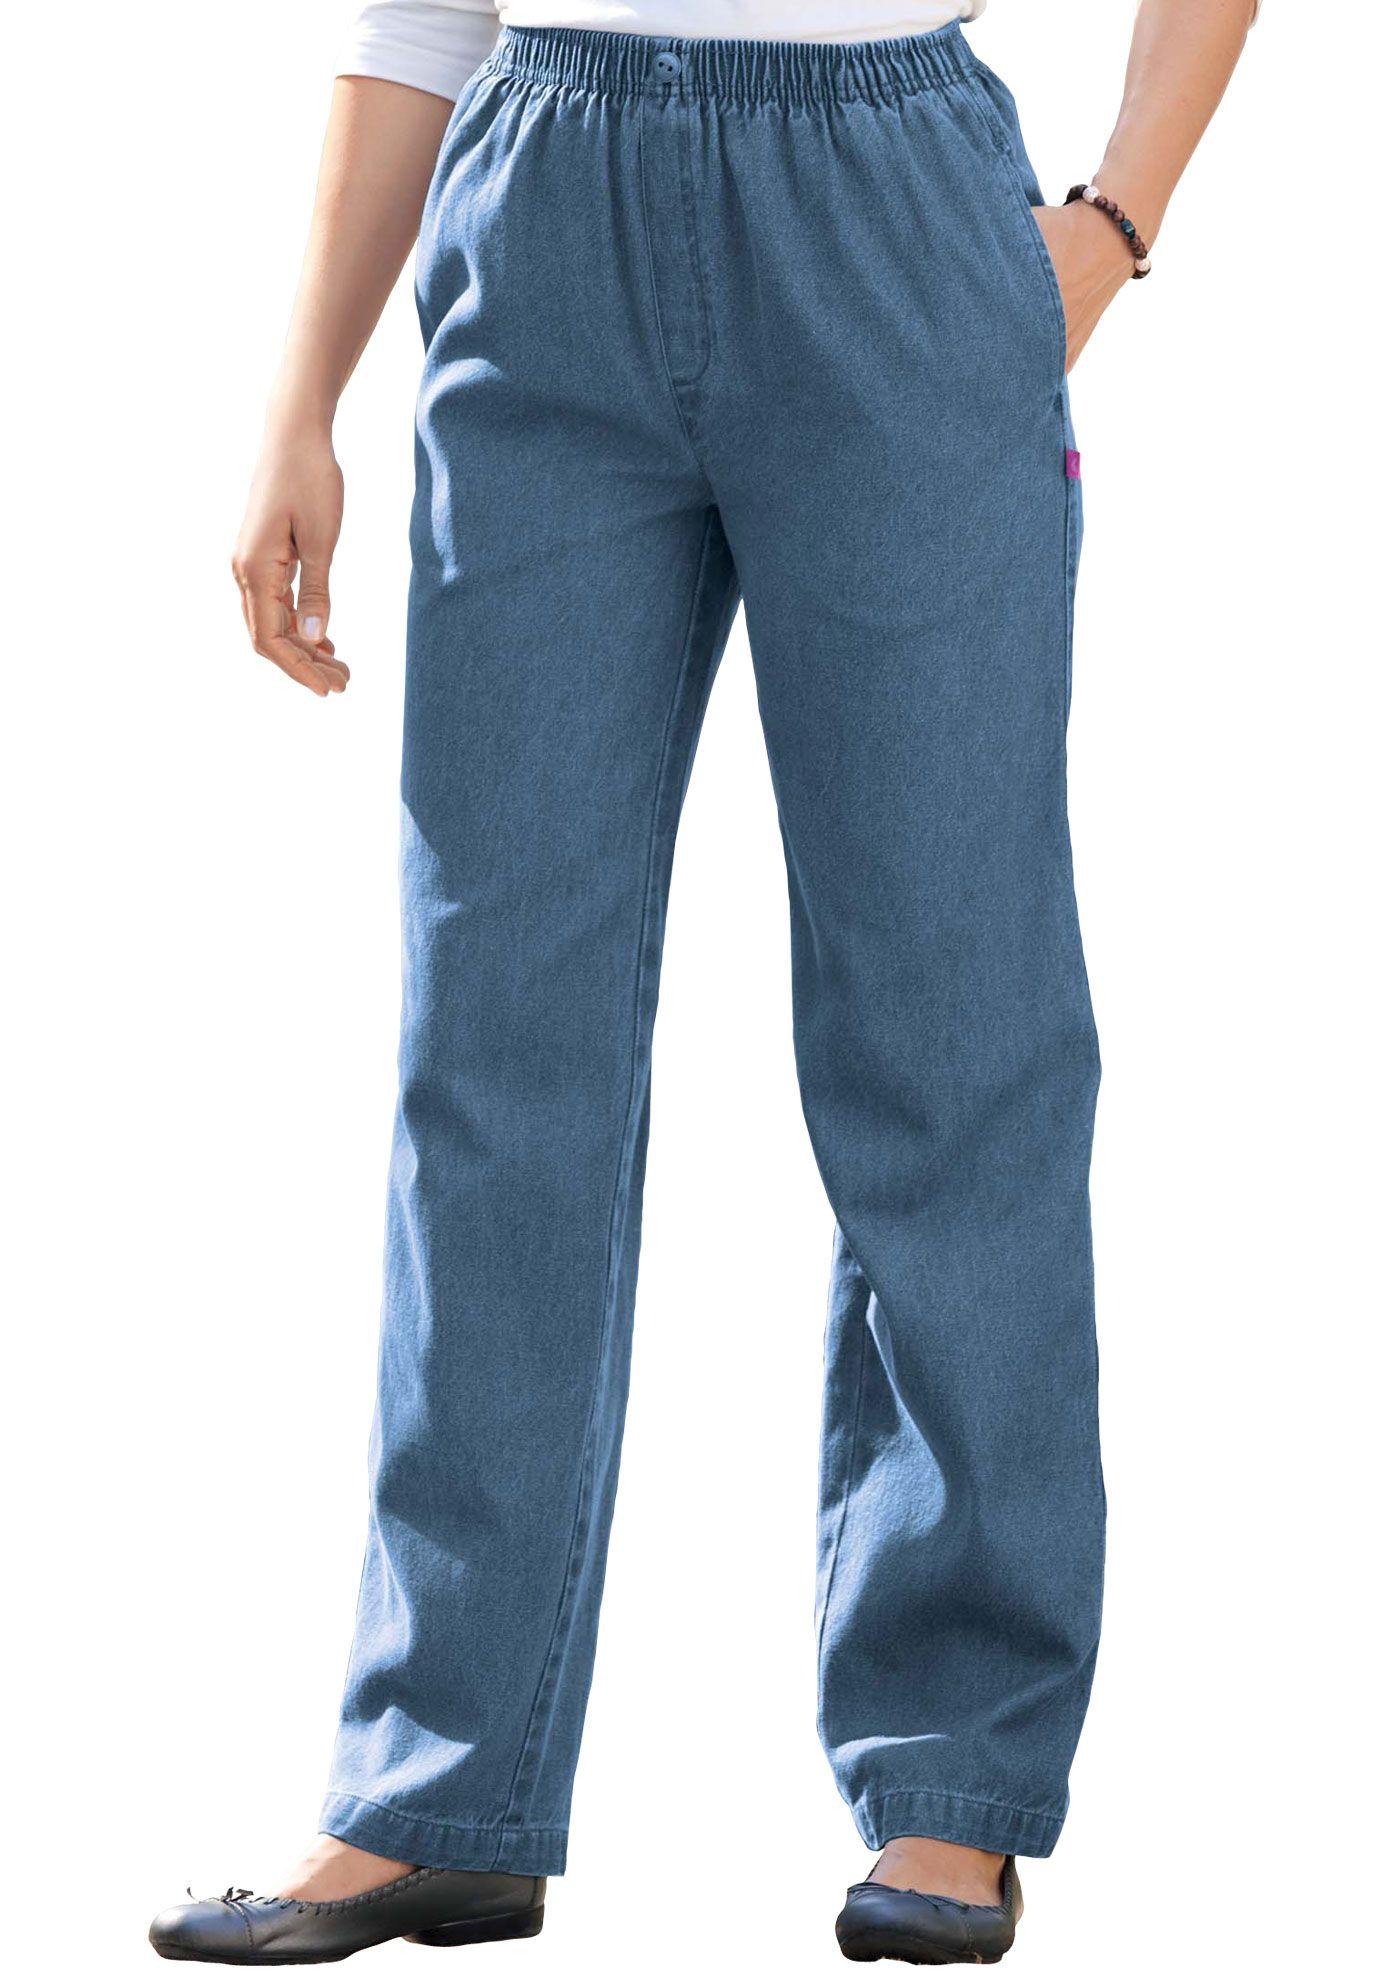 Size Petite Jean Pull Elastic Waist Pants & Skirts Woman